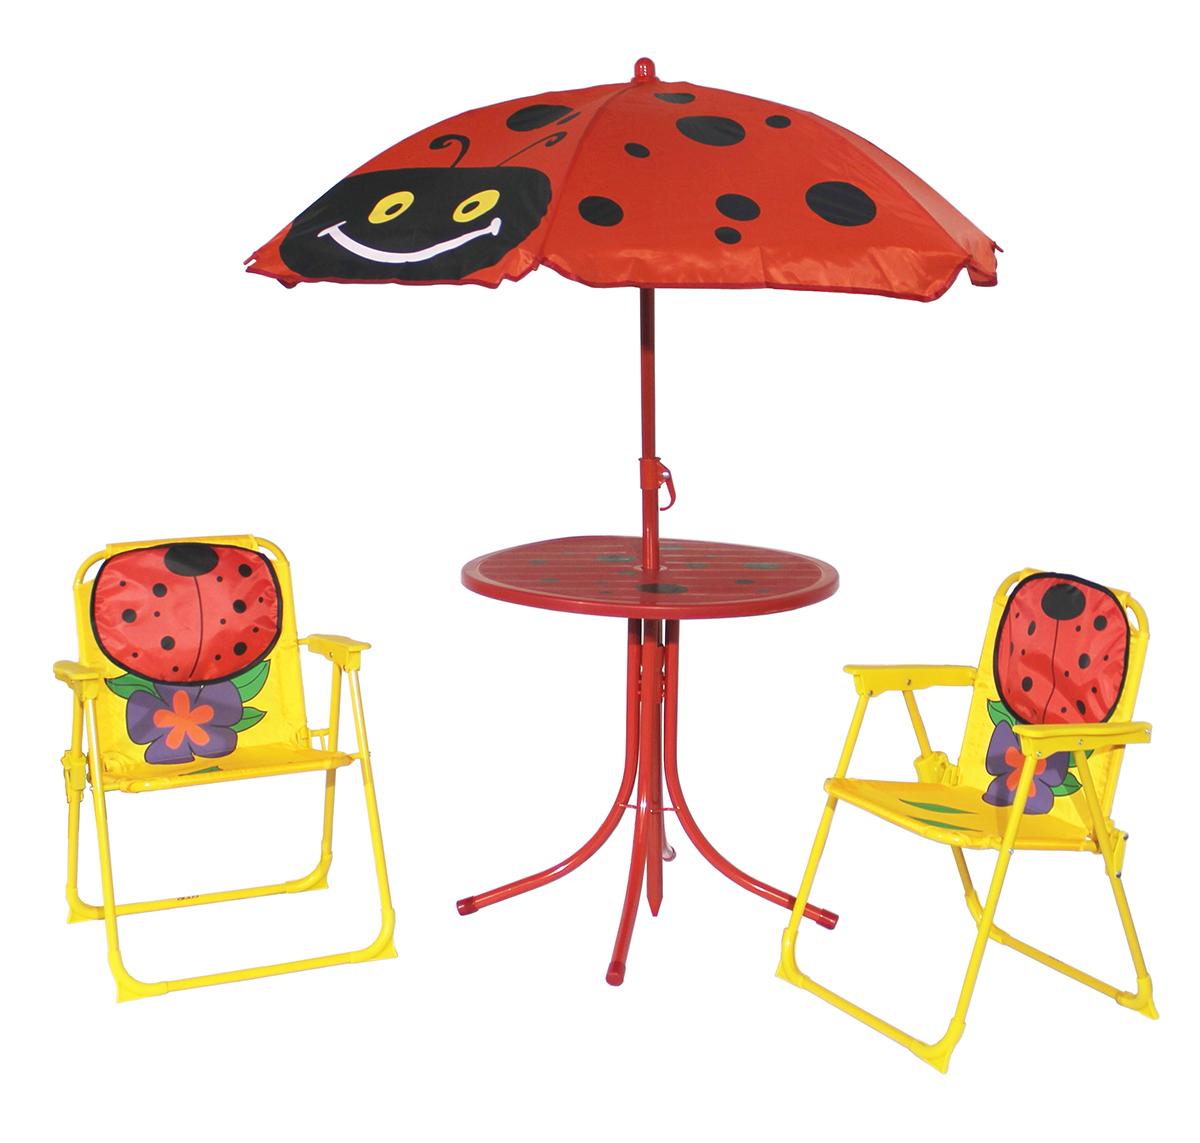 Top Kinder Gartenmöbel-Set 4-teilig Klappstühle Tisch Sonnenschirm XA75